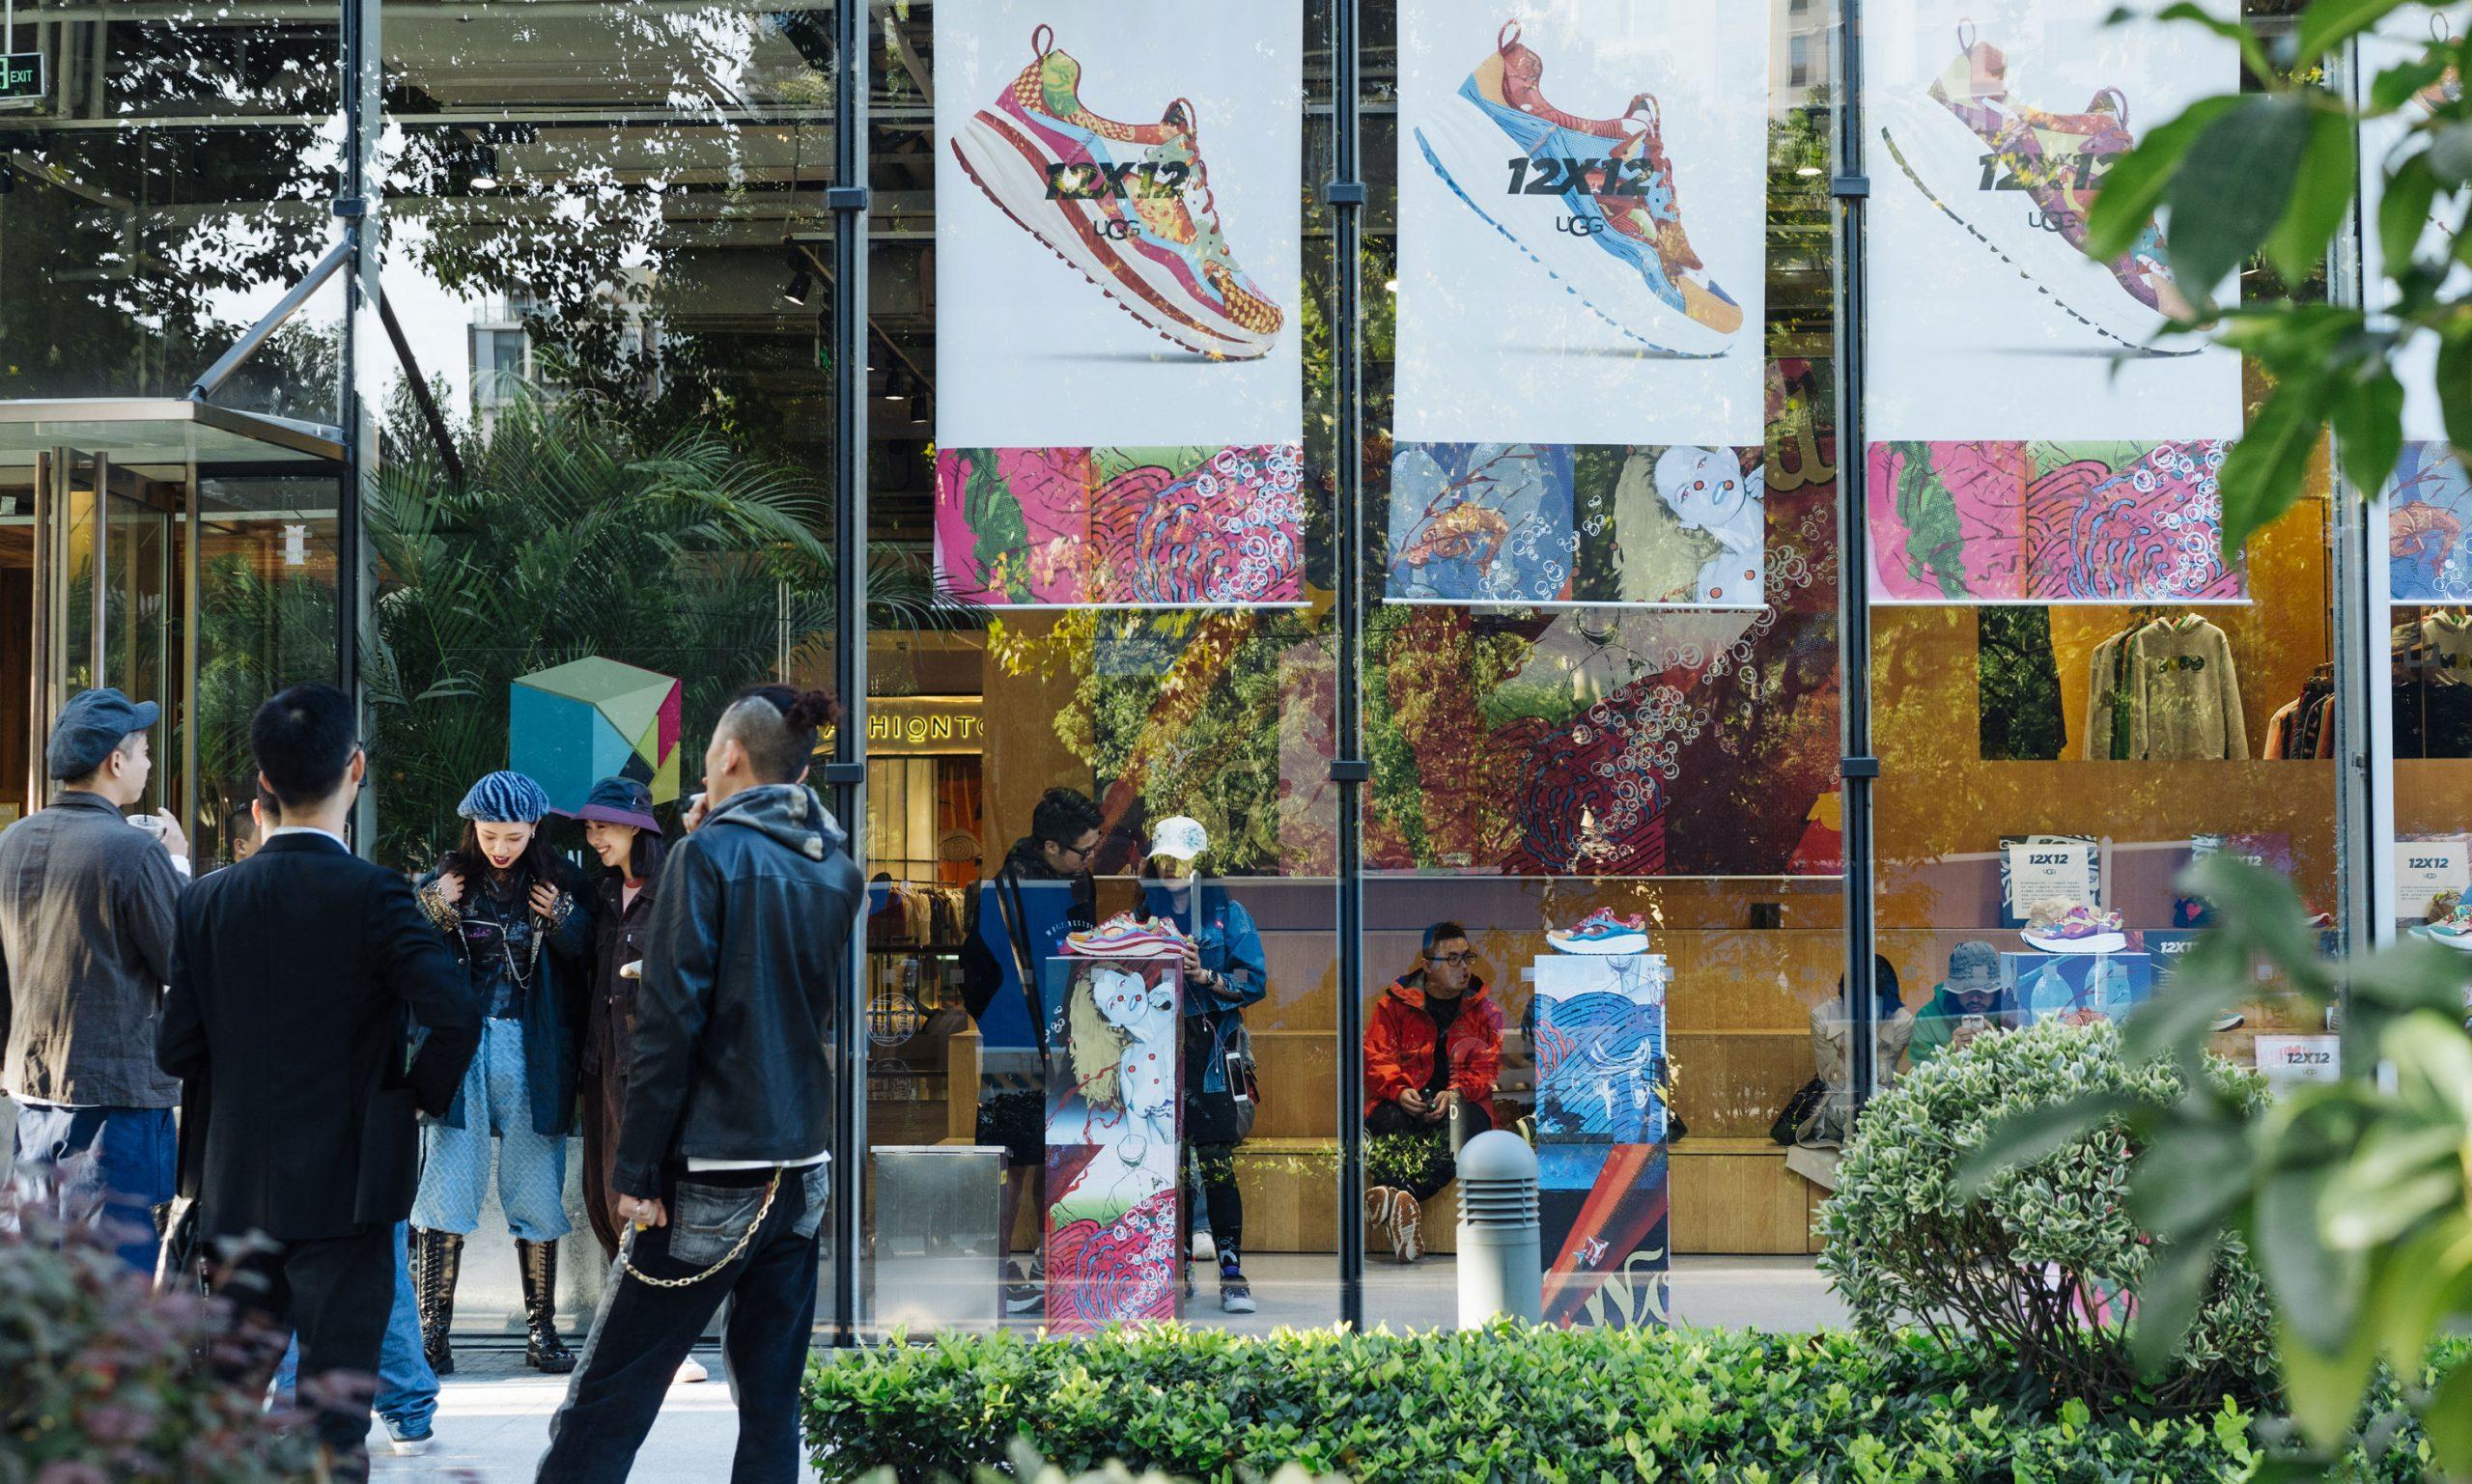 UGG 与 DOE 联合举办 CA805 x YOKOO 运动鞋发售派对